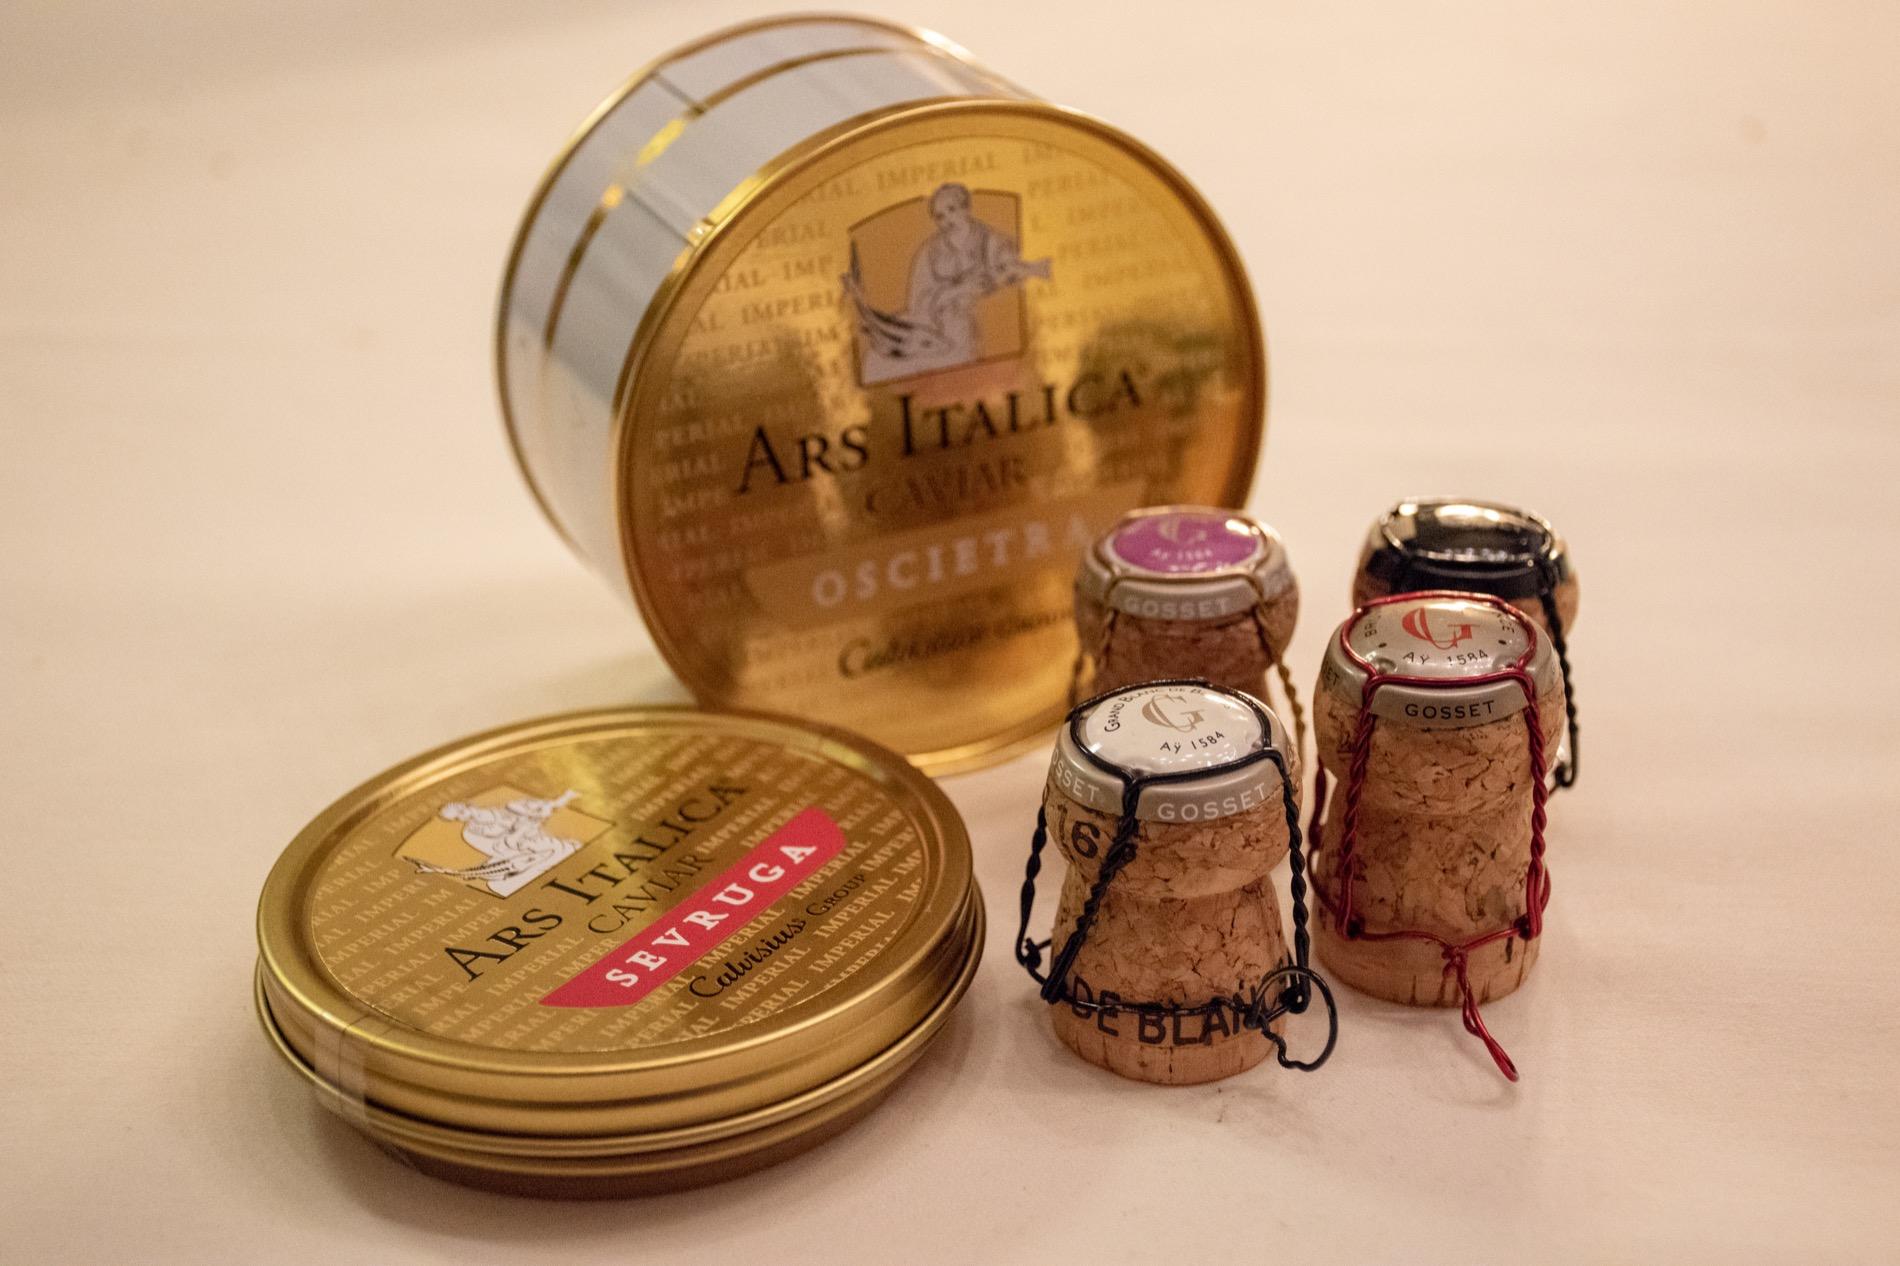 Ars Italica & Champagne Gosset @ Geneva